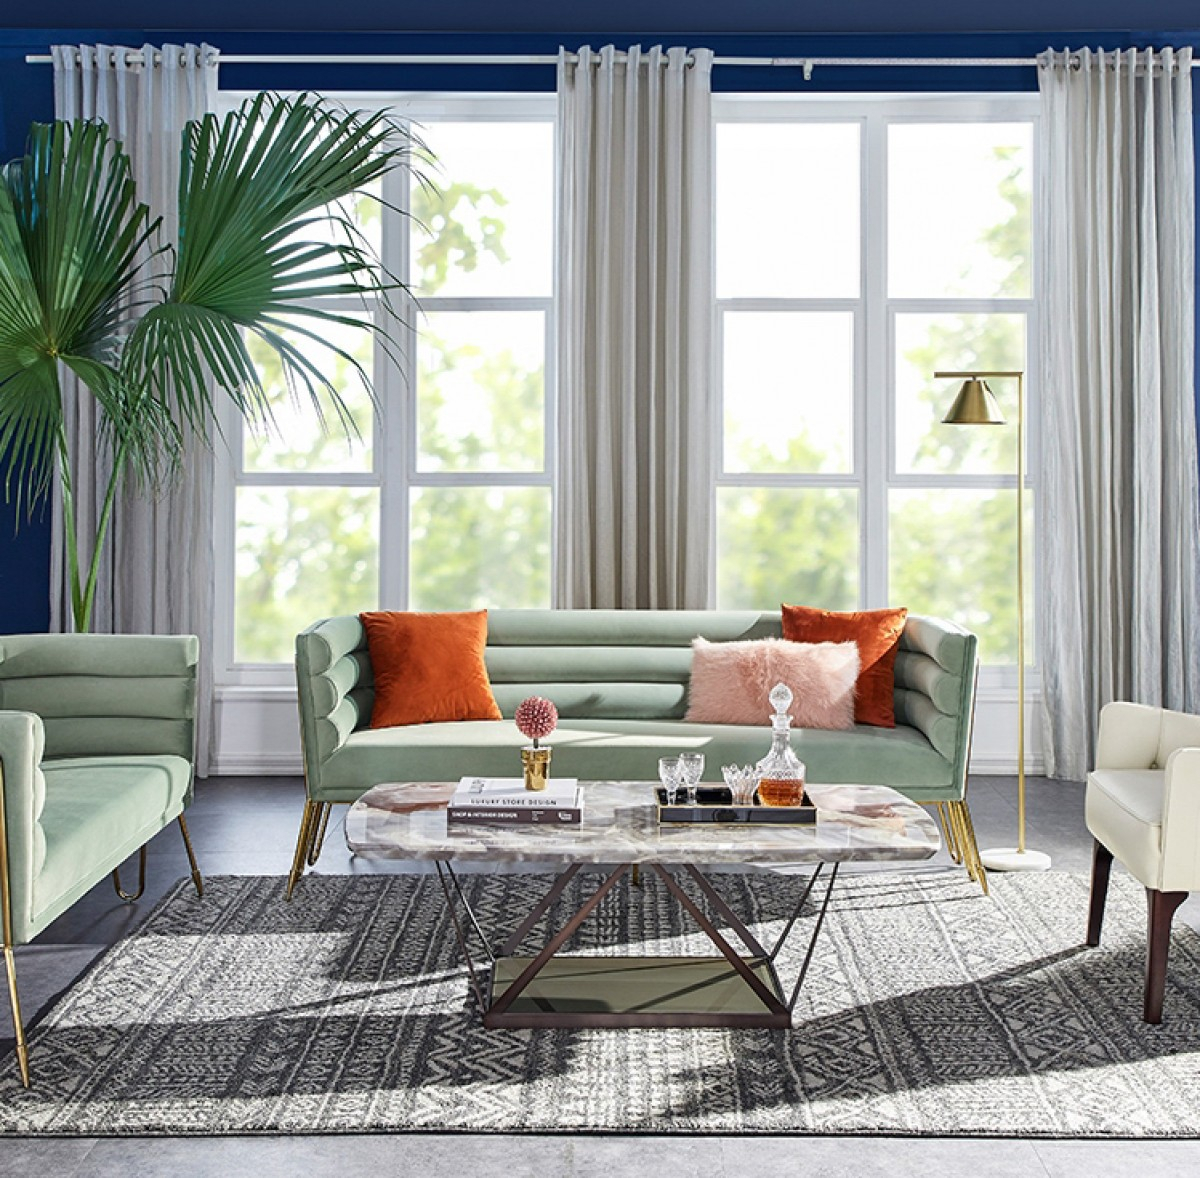 Divani Casa Bixby Modern Light Green Velvet & Gold Sofa Throughout Sofas And Chairs (View 15 of 15)